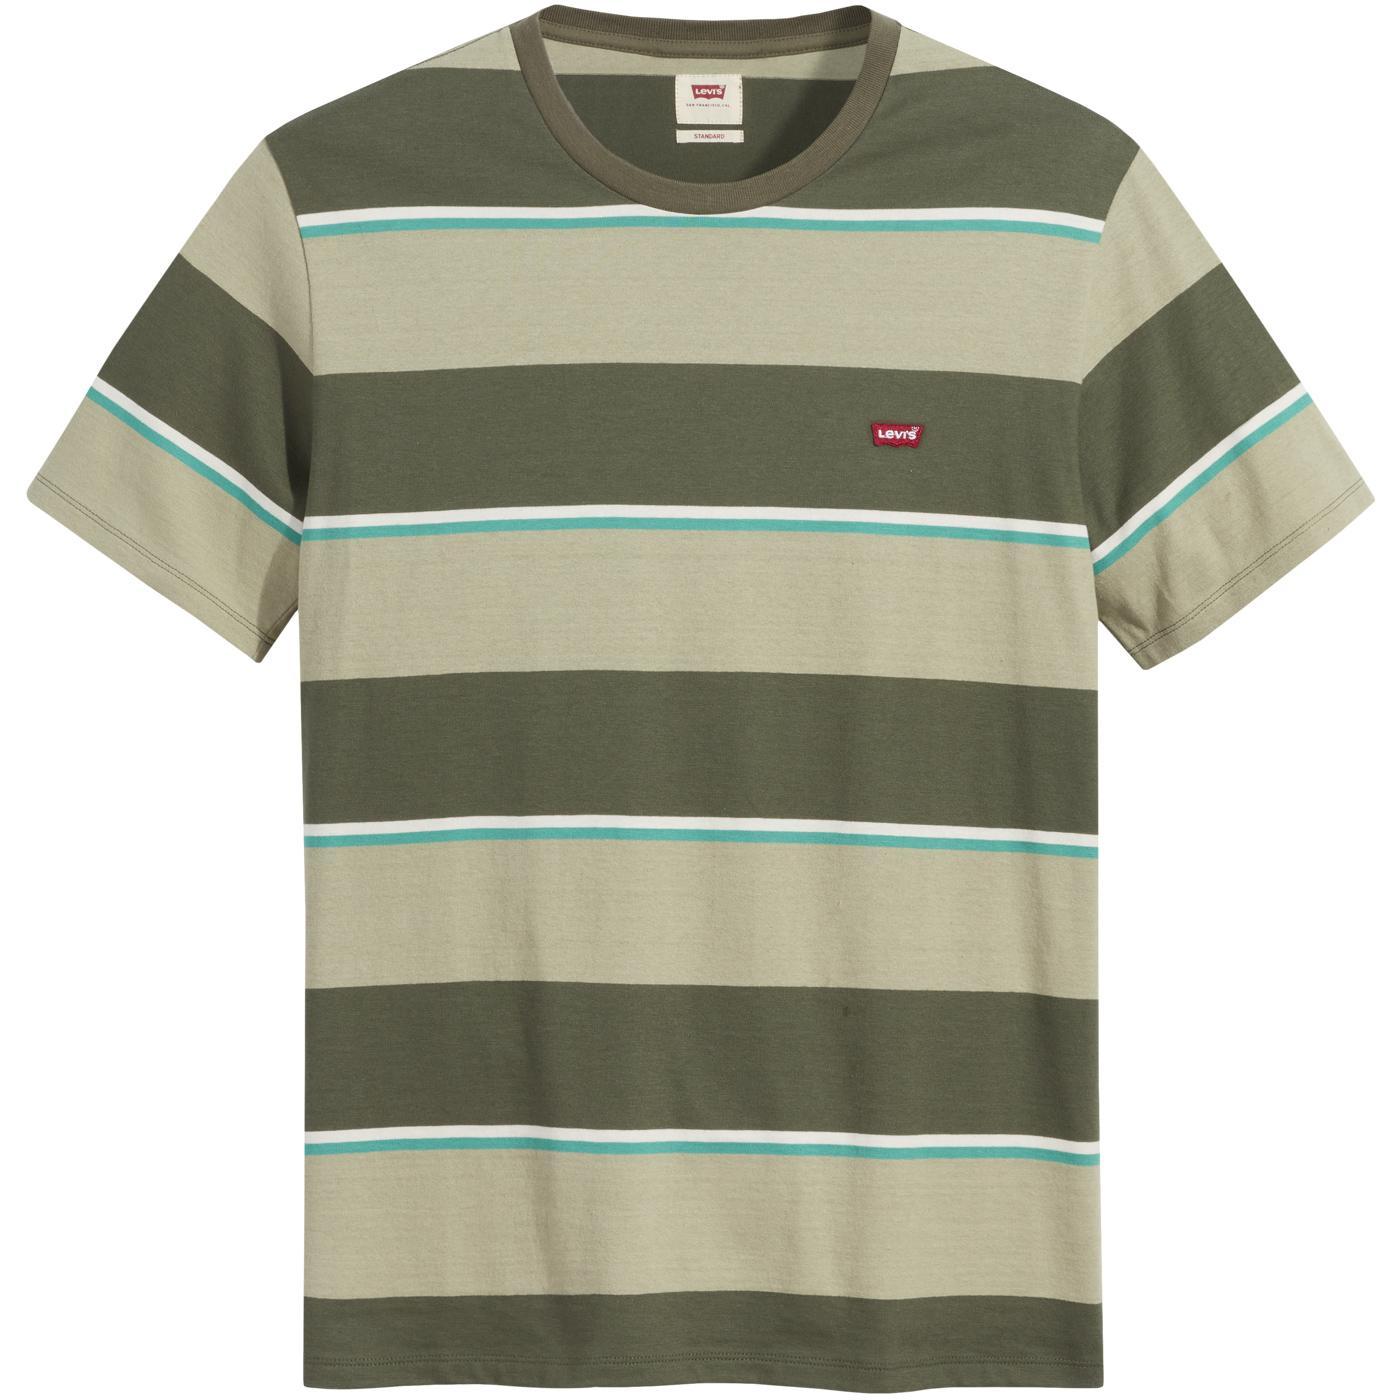 LEVI'S Original HM Men's Retro Stripe Tee (Green)